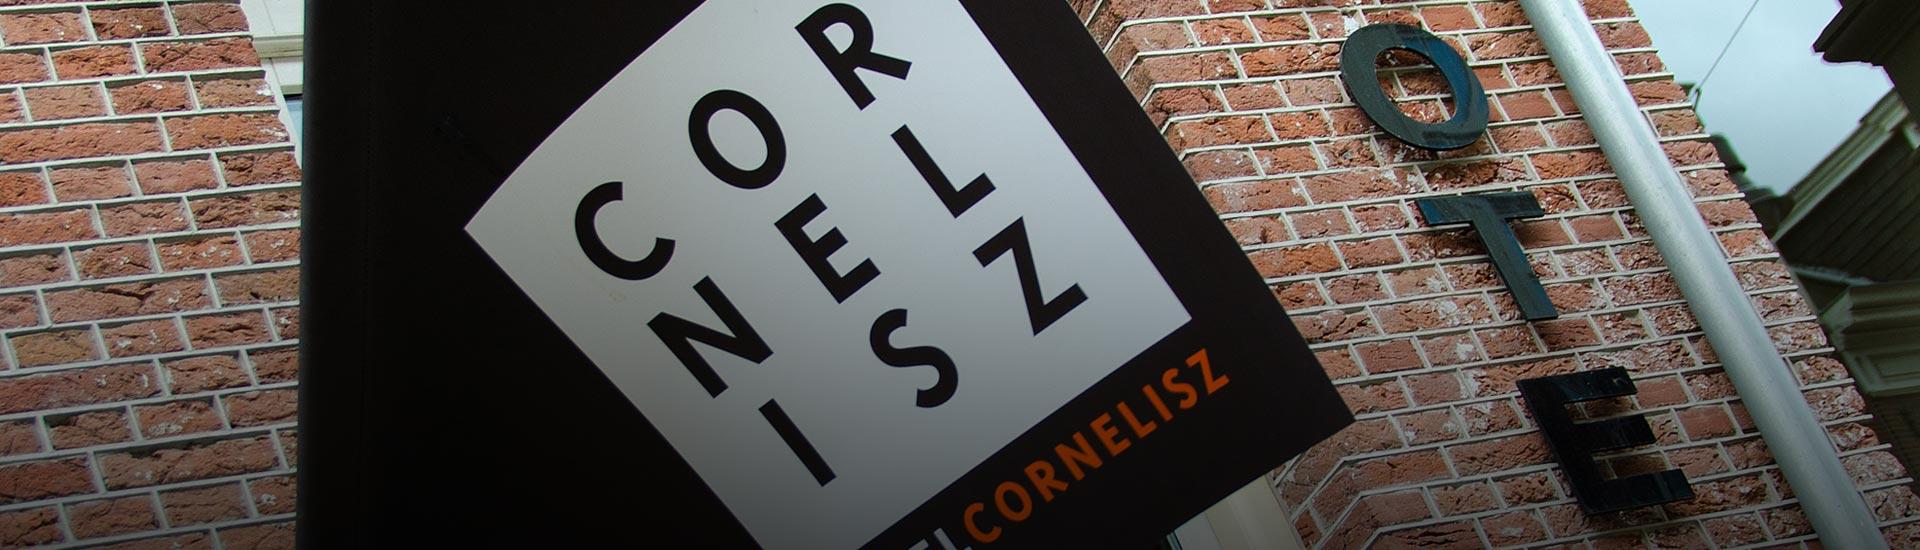 Contact hotel cornelisz for Contact hotel